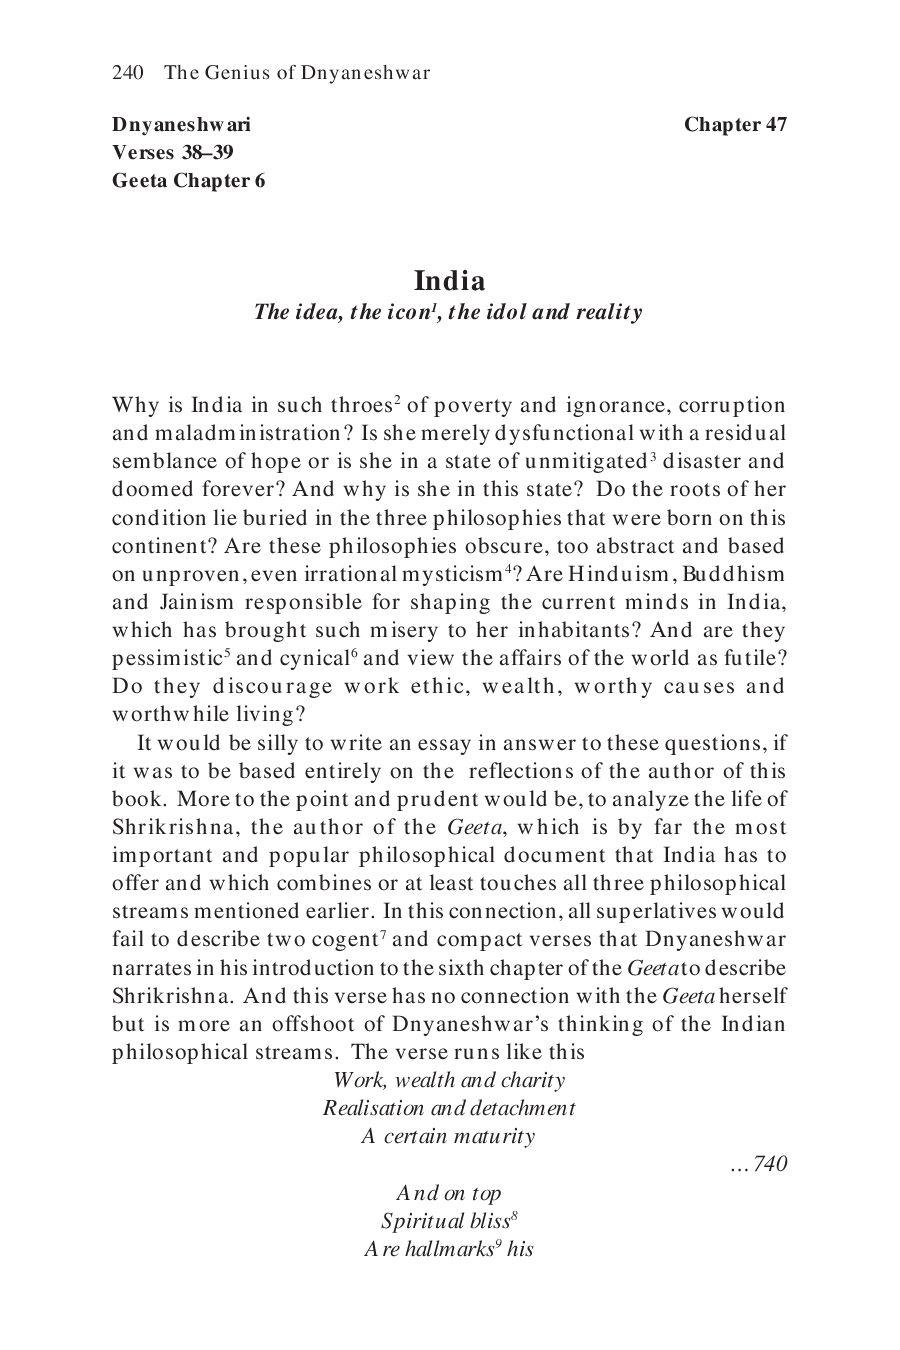 Essay on my pet dog in marathi